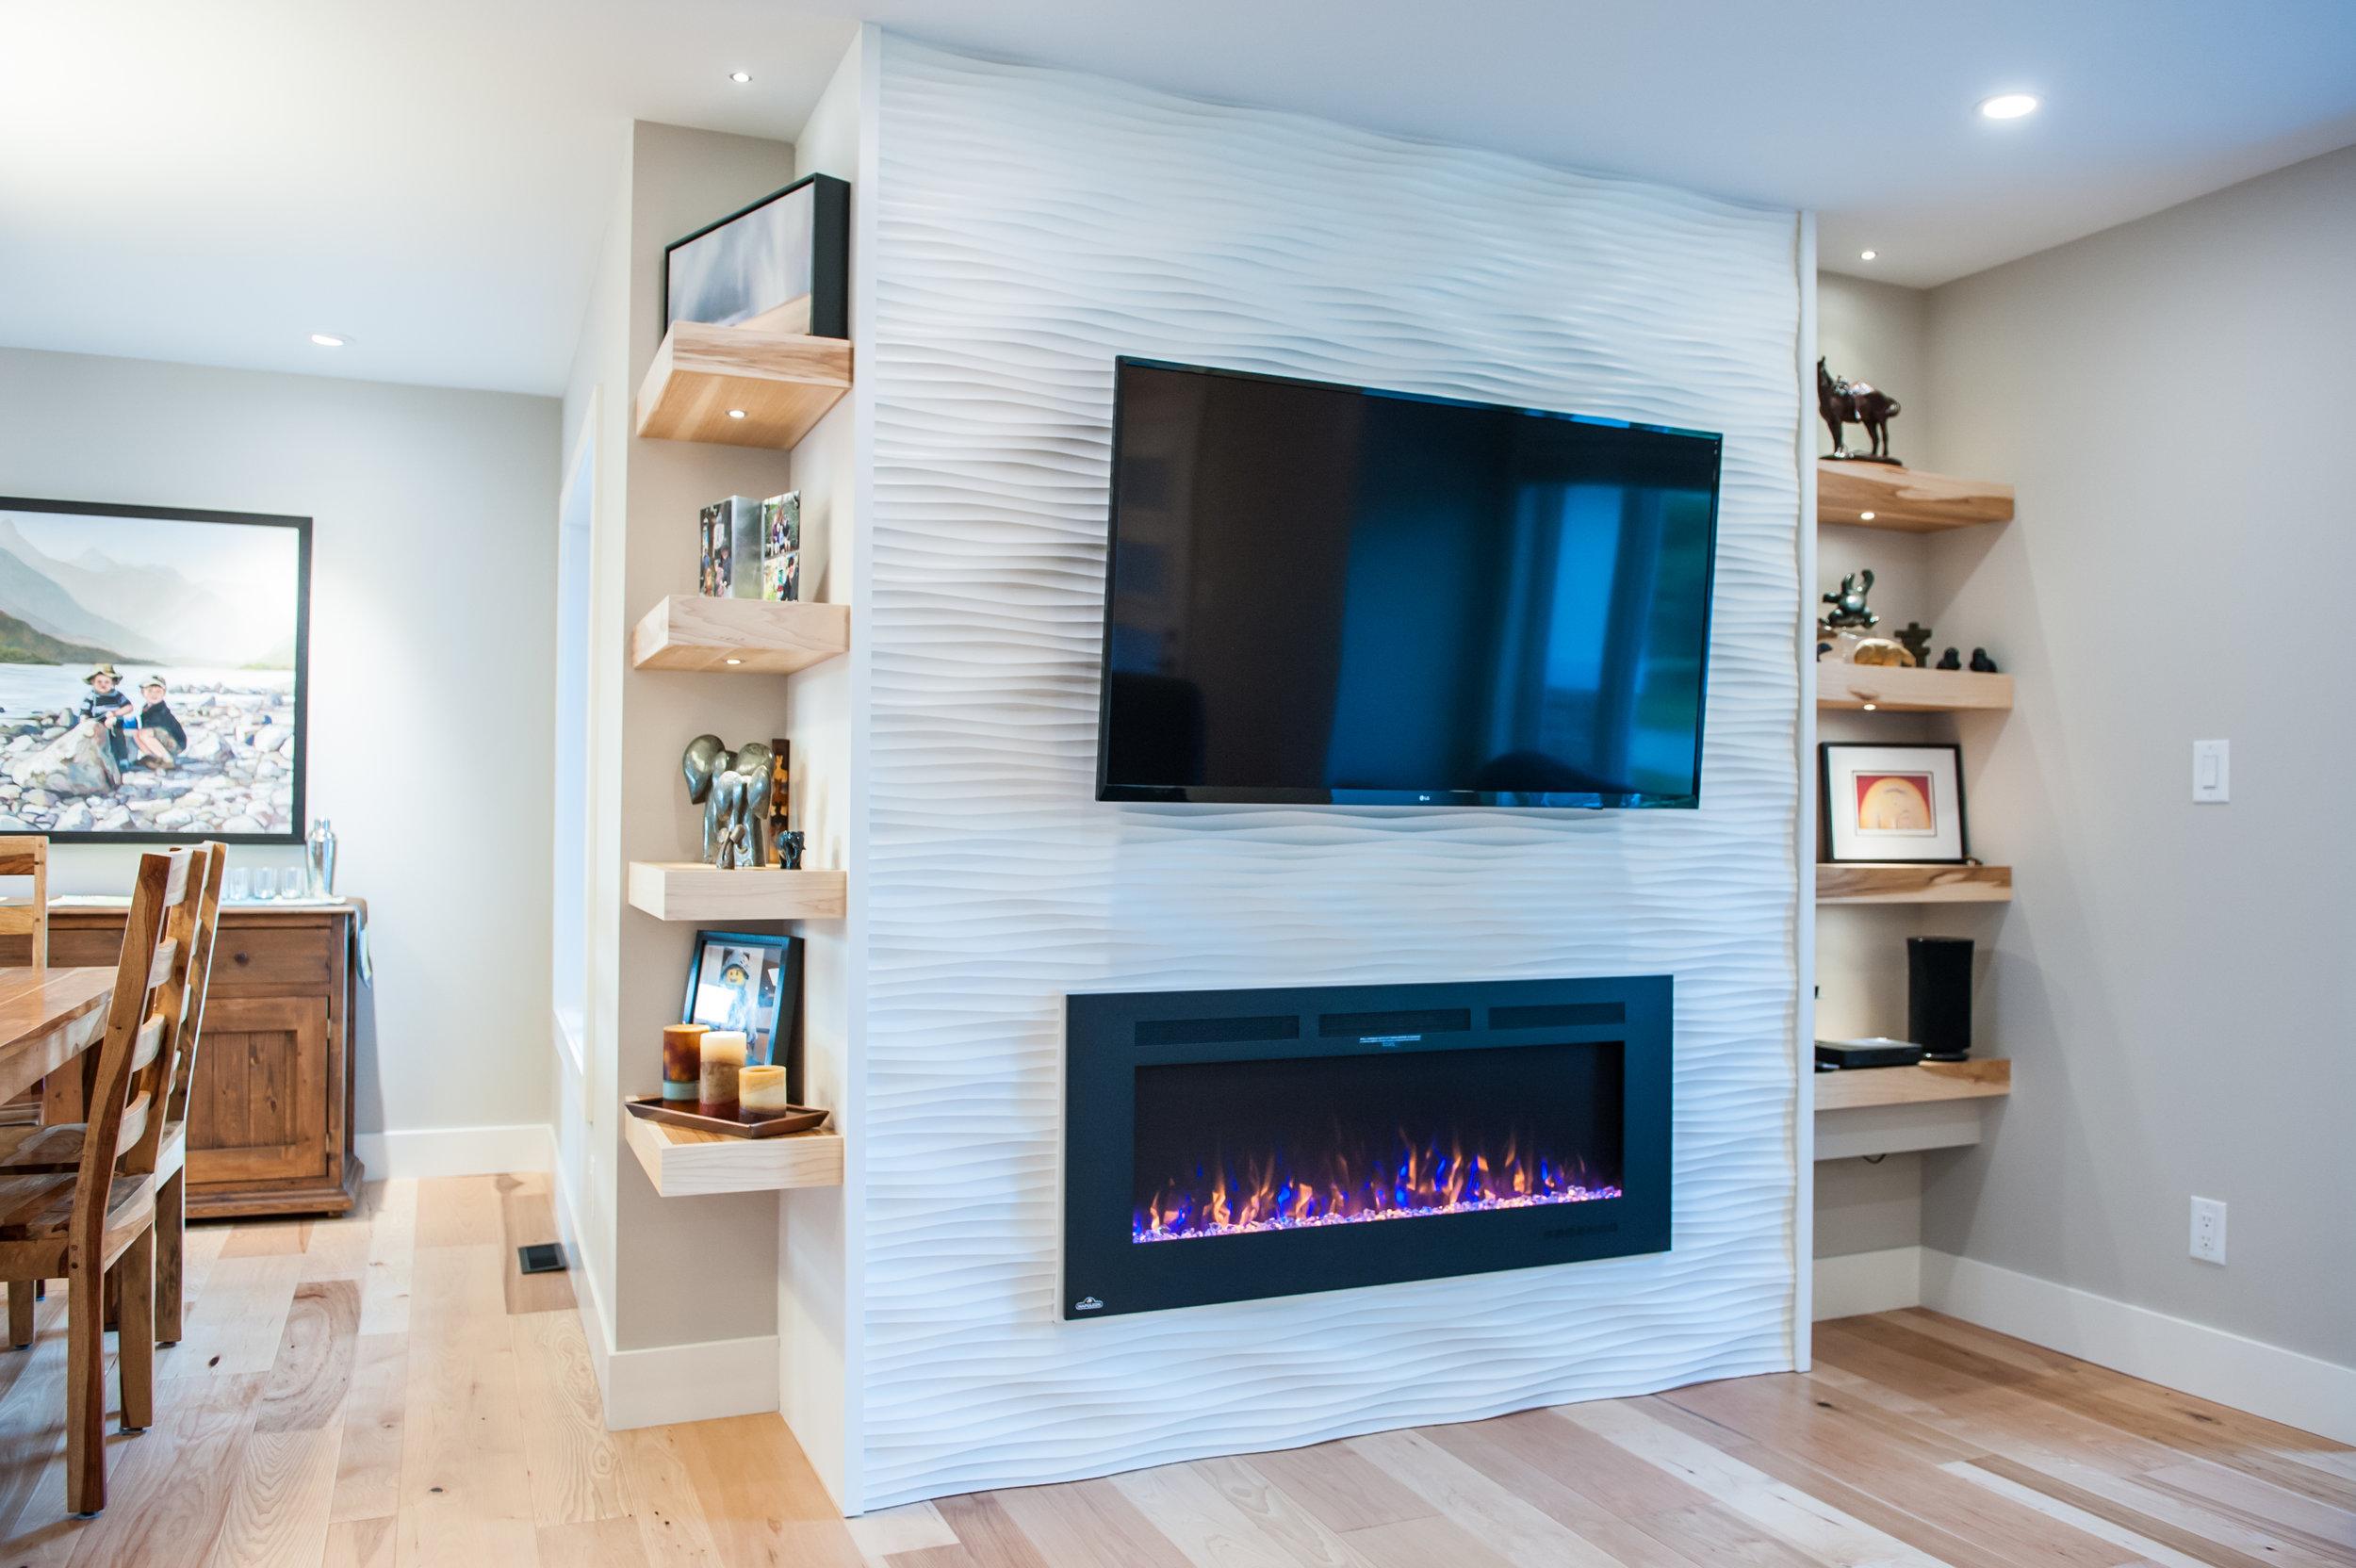 wavy_tile_fireplace_open_shelves